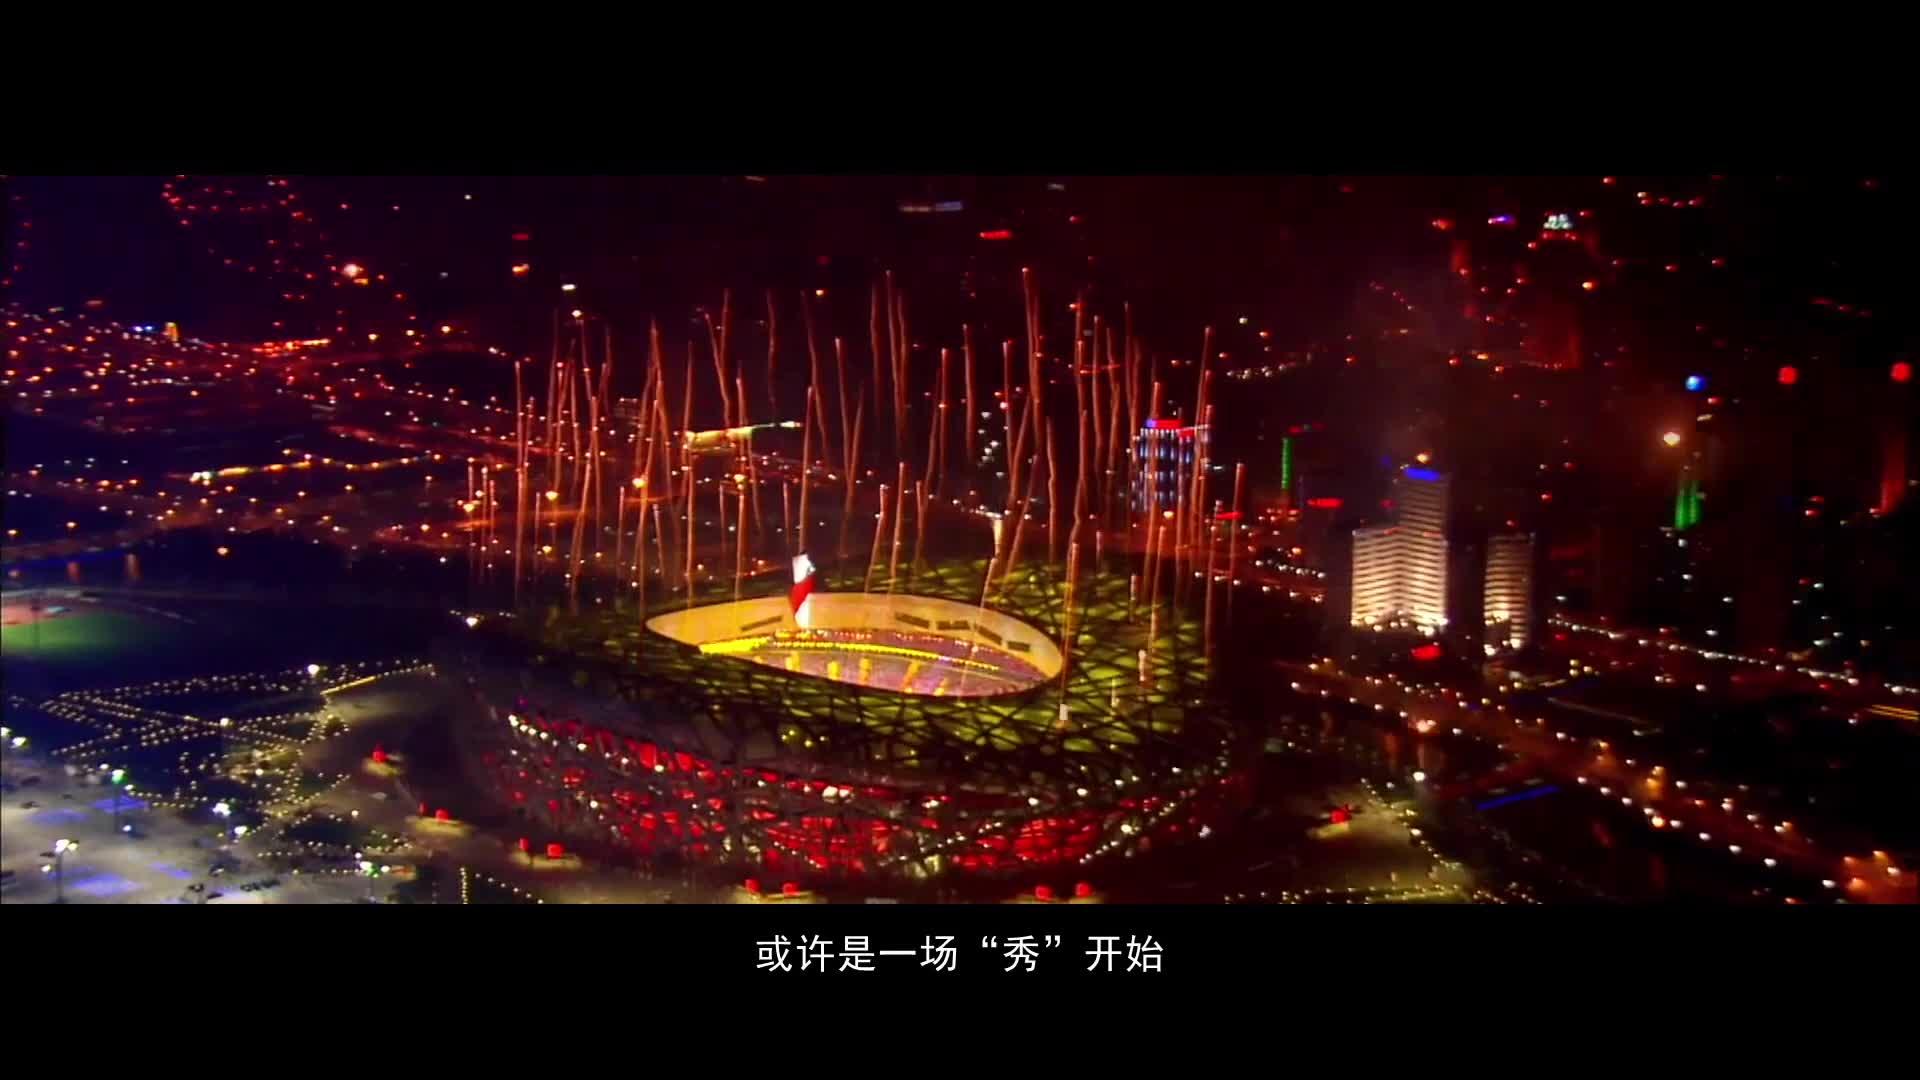 Beijing: City of Charming Performances